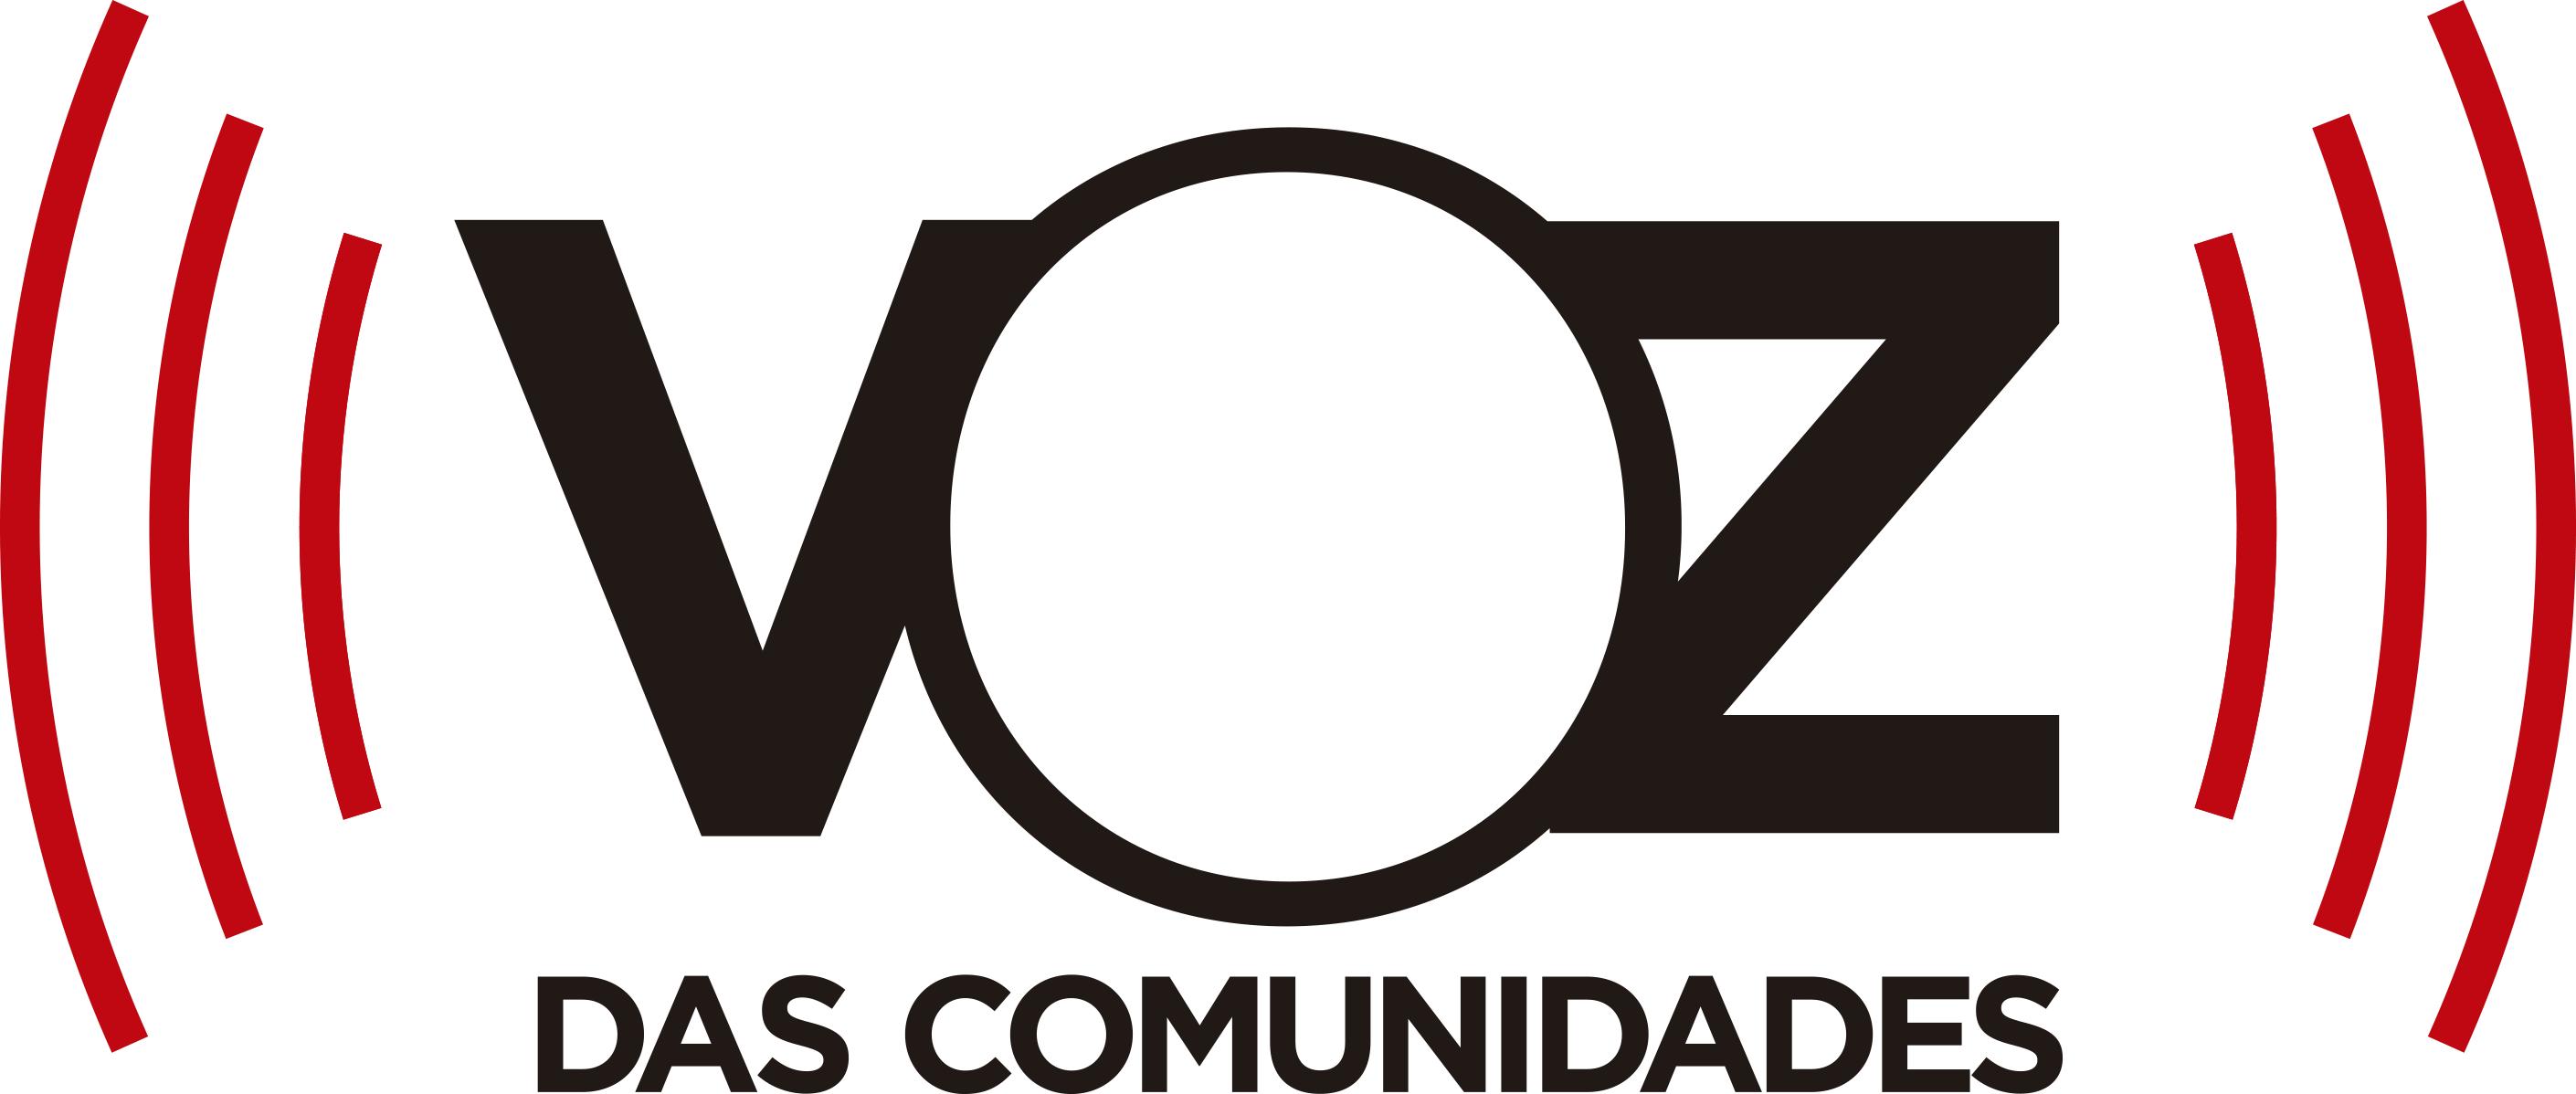 Logo do Voz